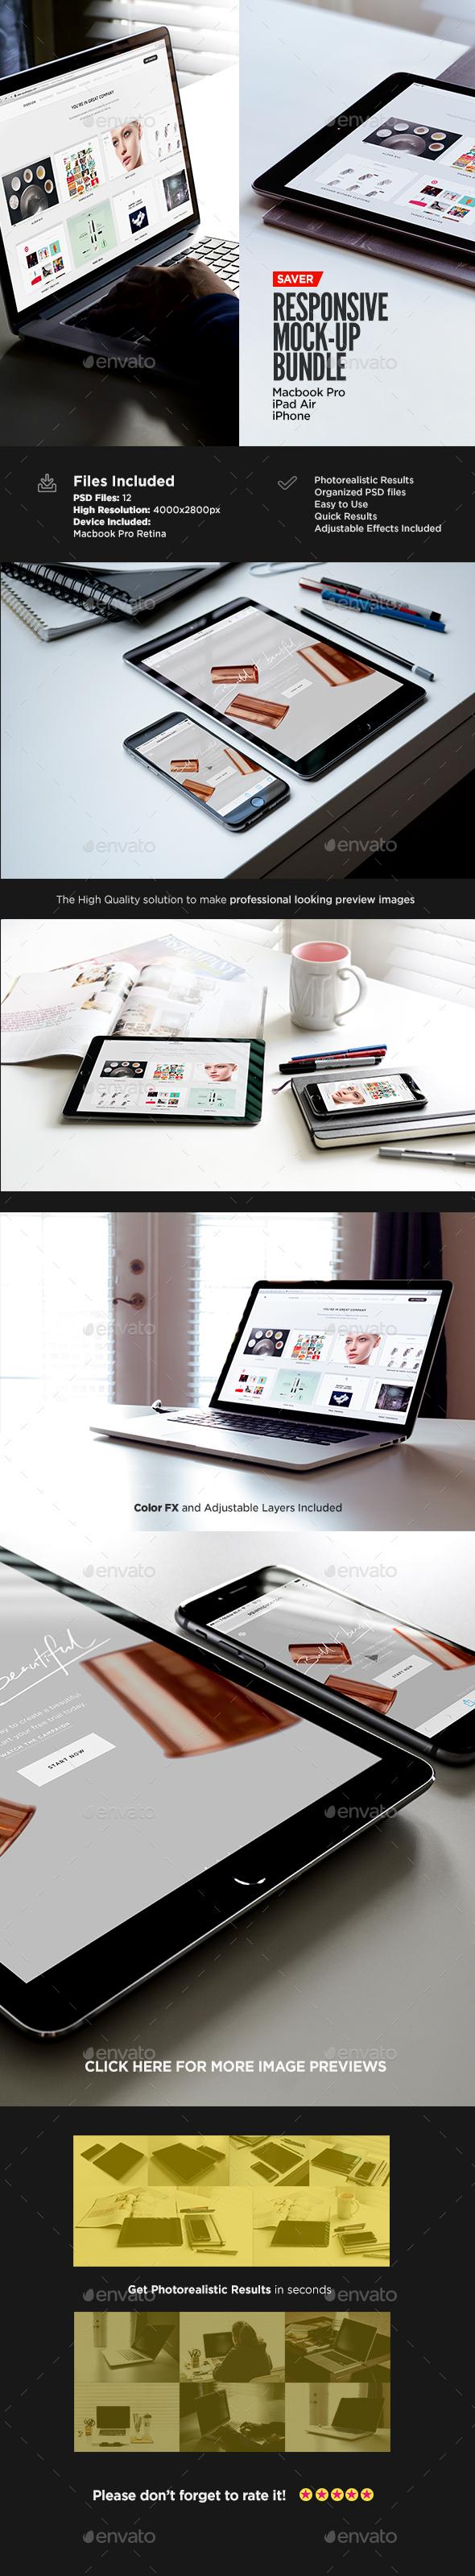 Responsive Screen MockUp Pack   Bundle Edition - Multiple Displays